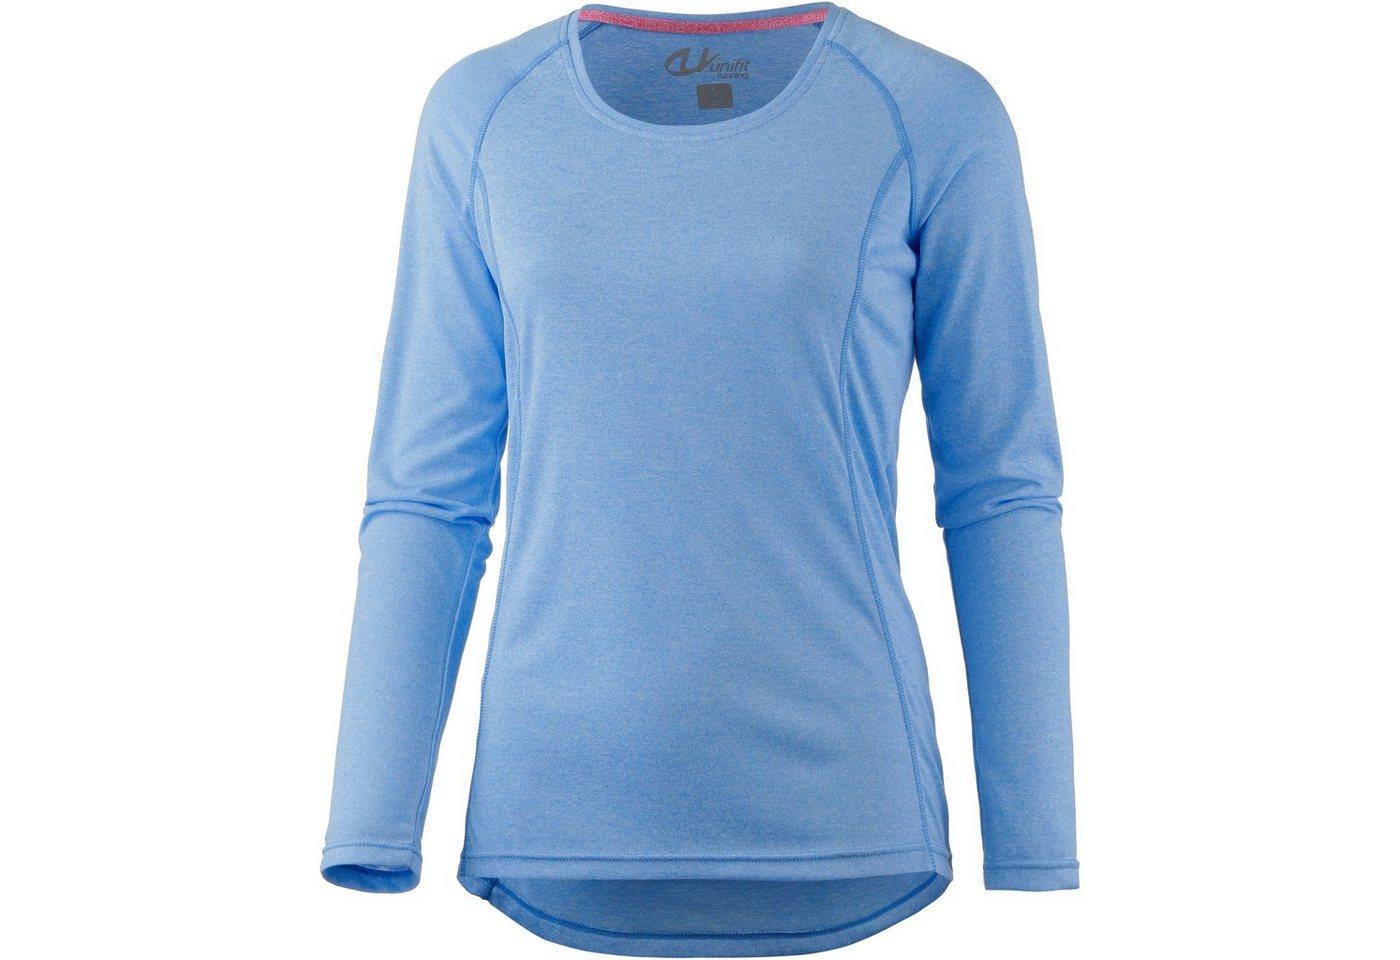 unifit Laufshirt | Sportbekleidung > Sportshirts > Laufshirts | Blau | Polyester | unifit